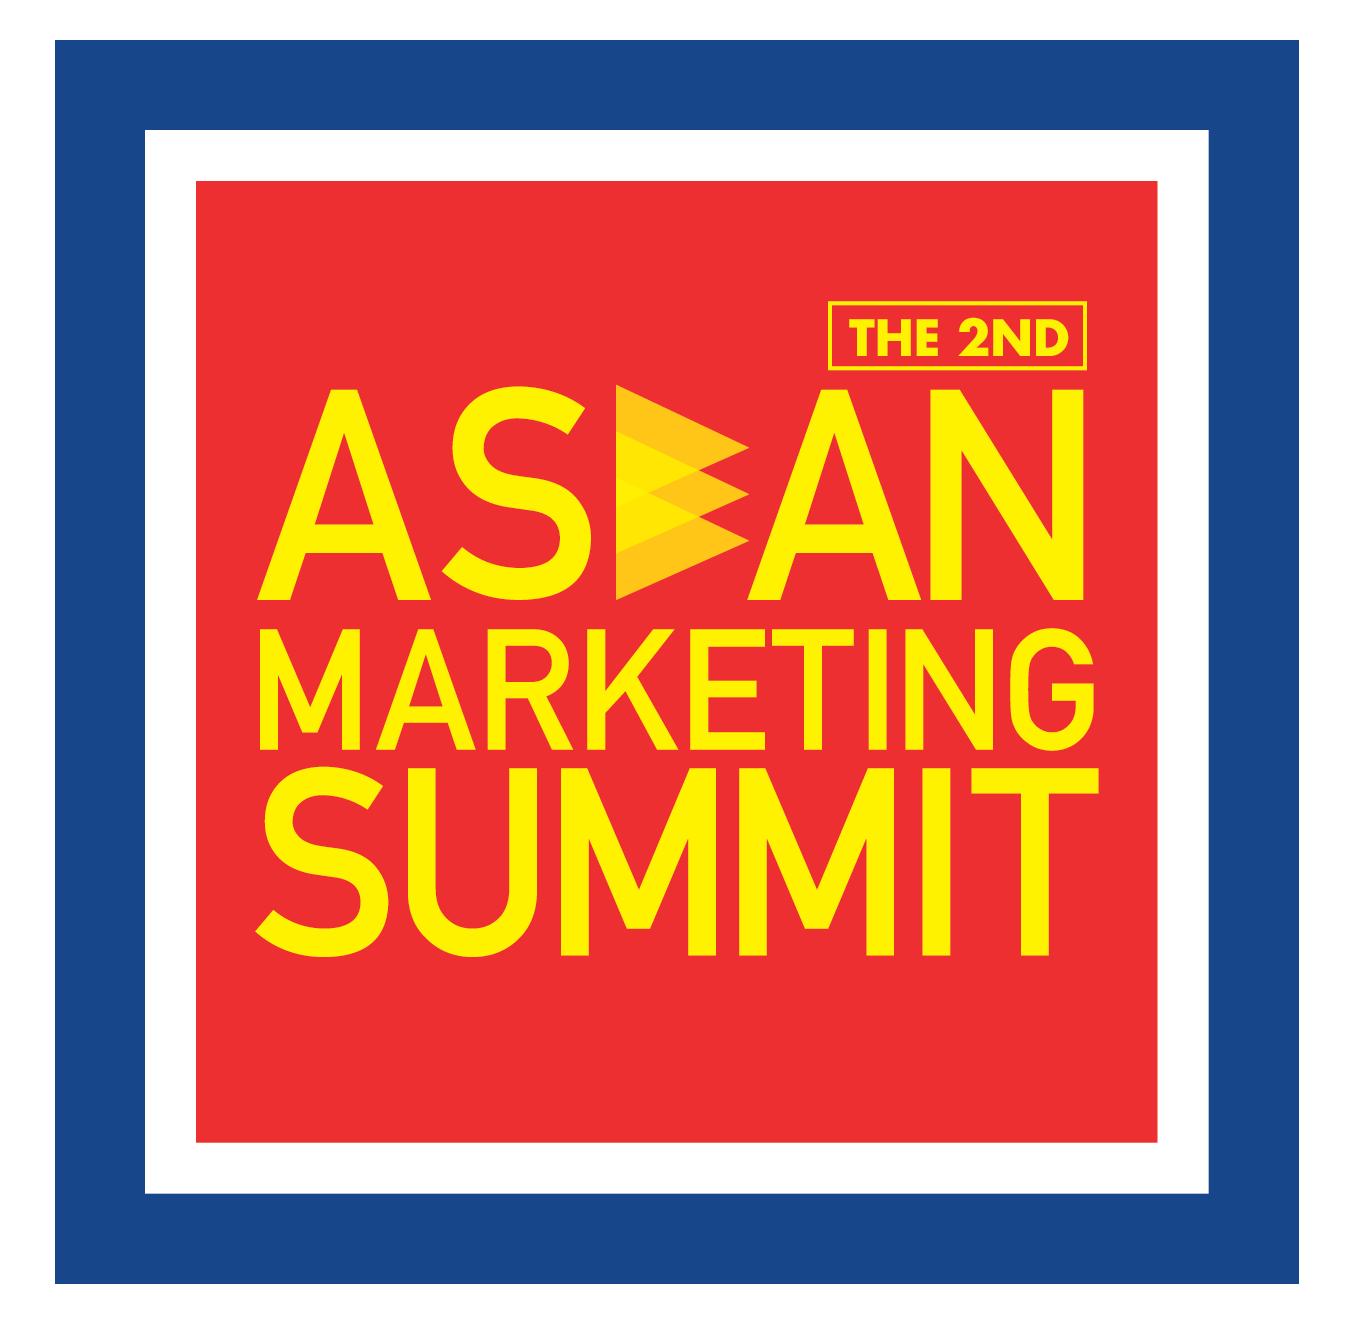 Asean Marketing Summit 2016